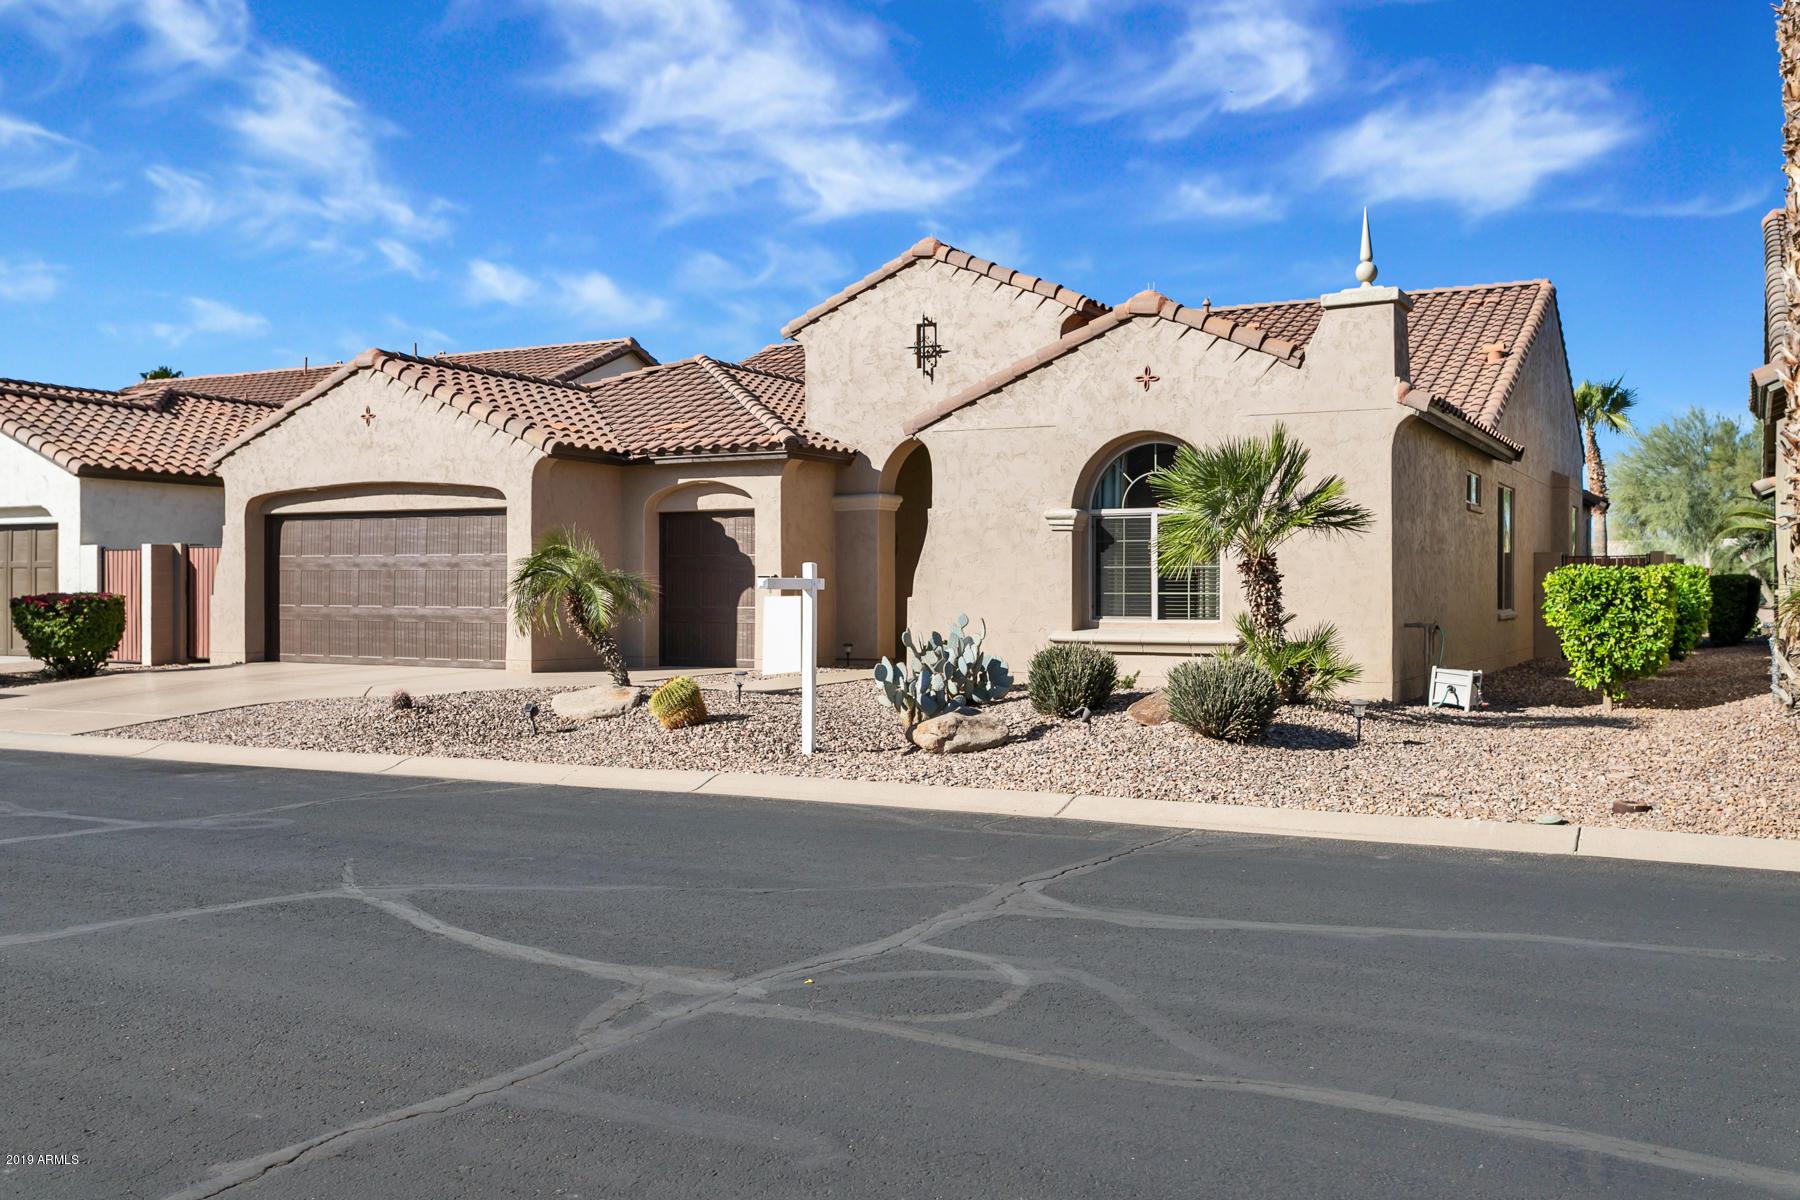 Photo of 3764 N 160TH Avenue, Goodyear, AZ 85395